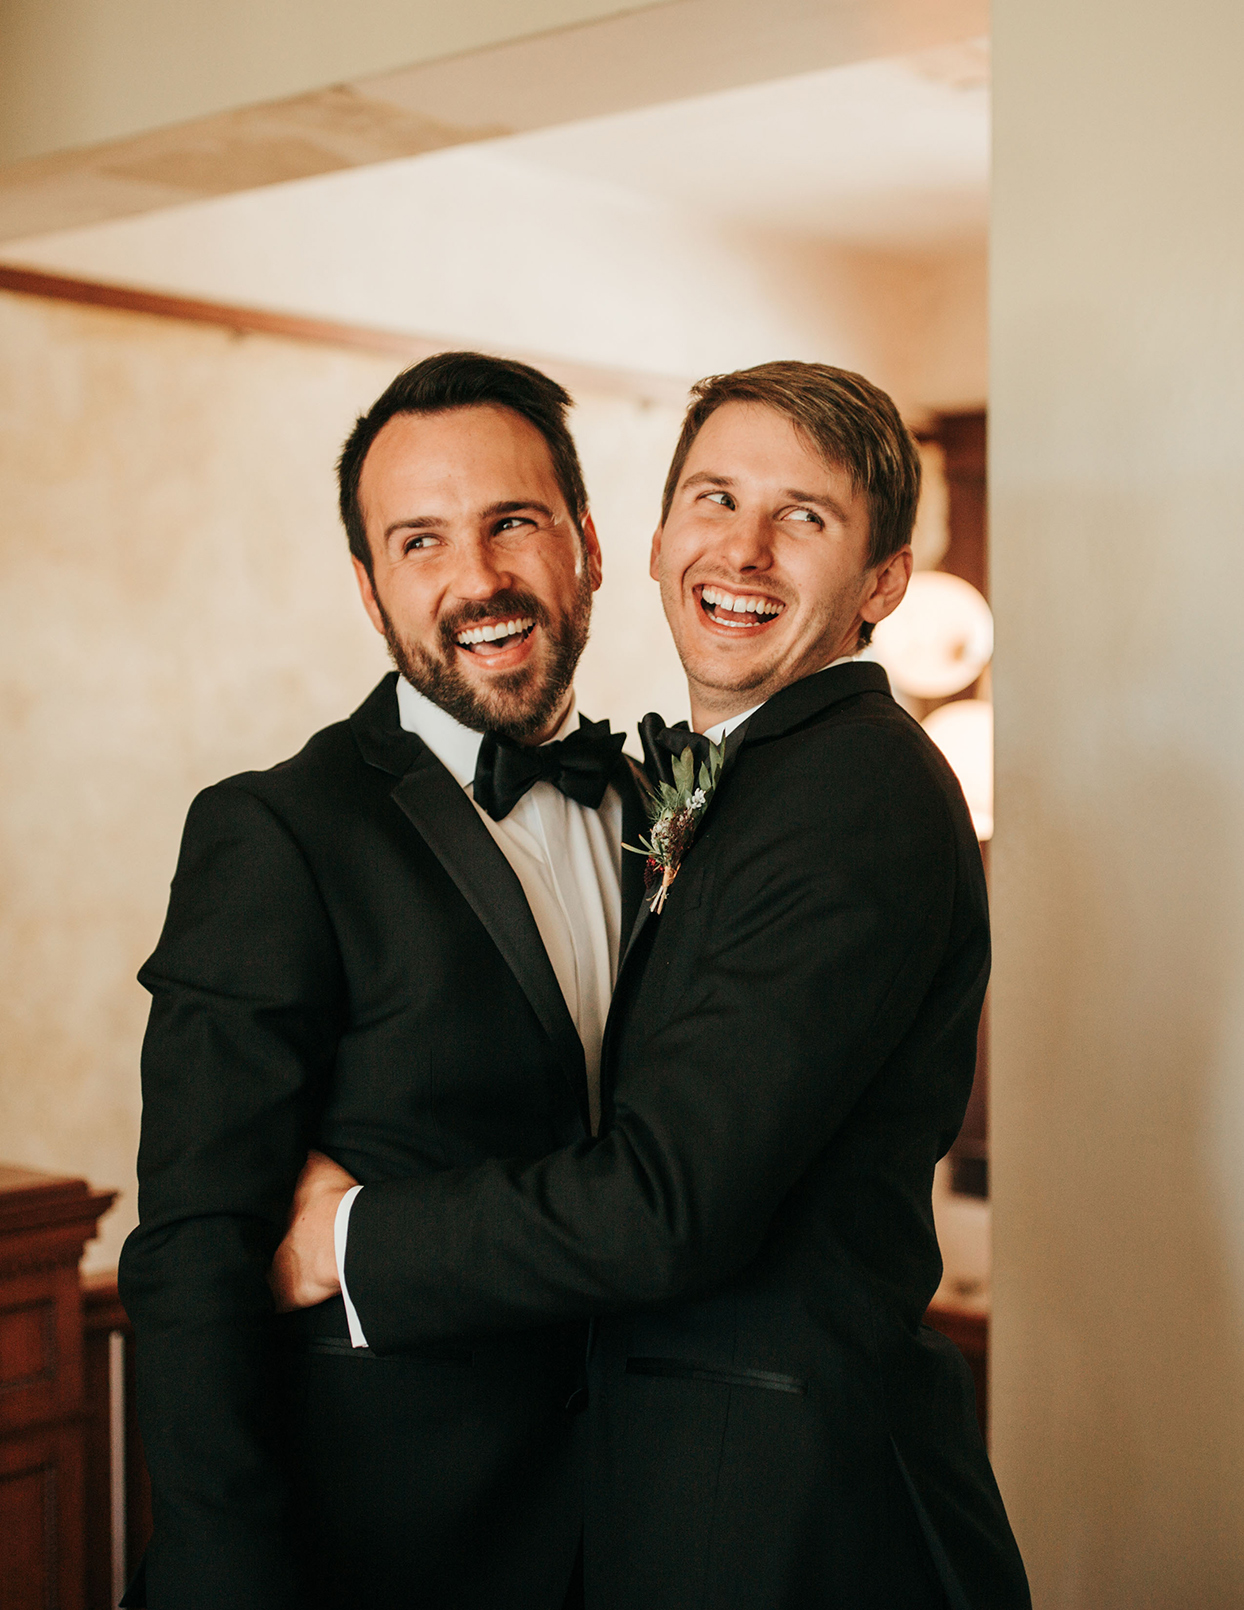 austin alex wedding couple smiling first look